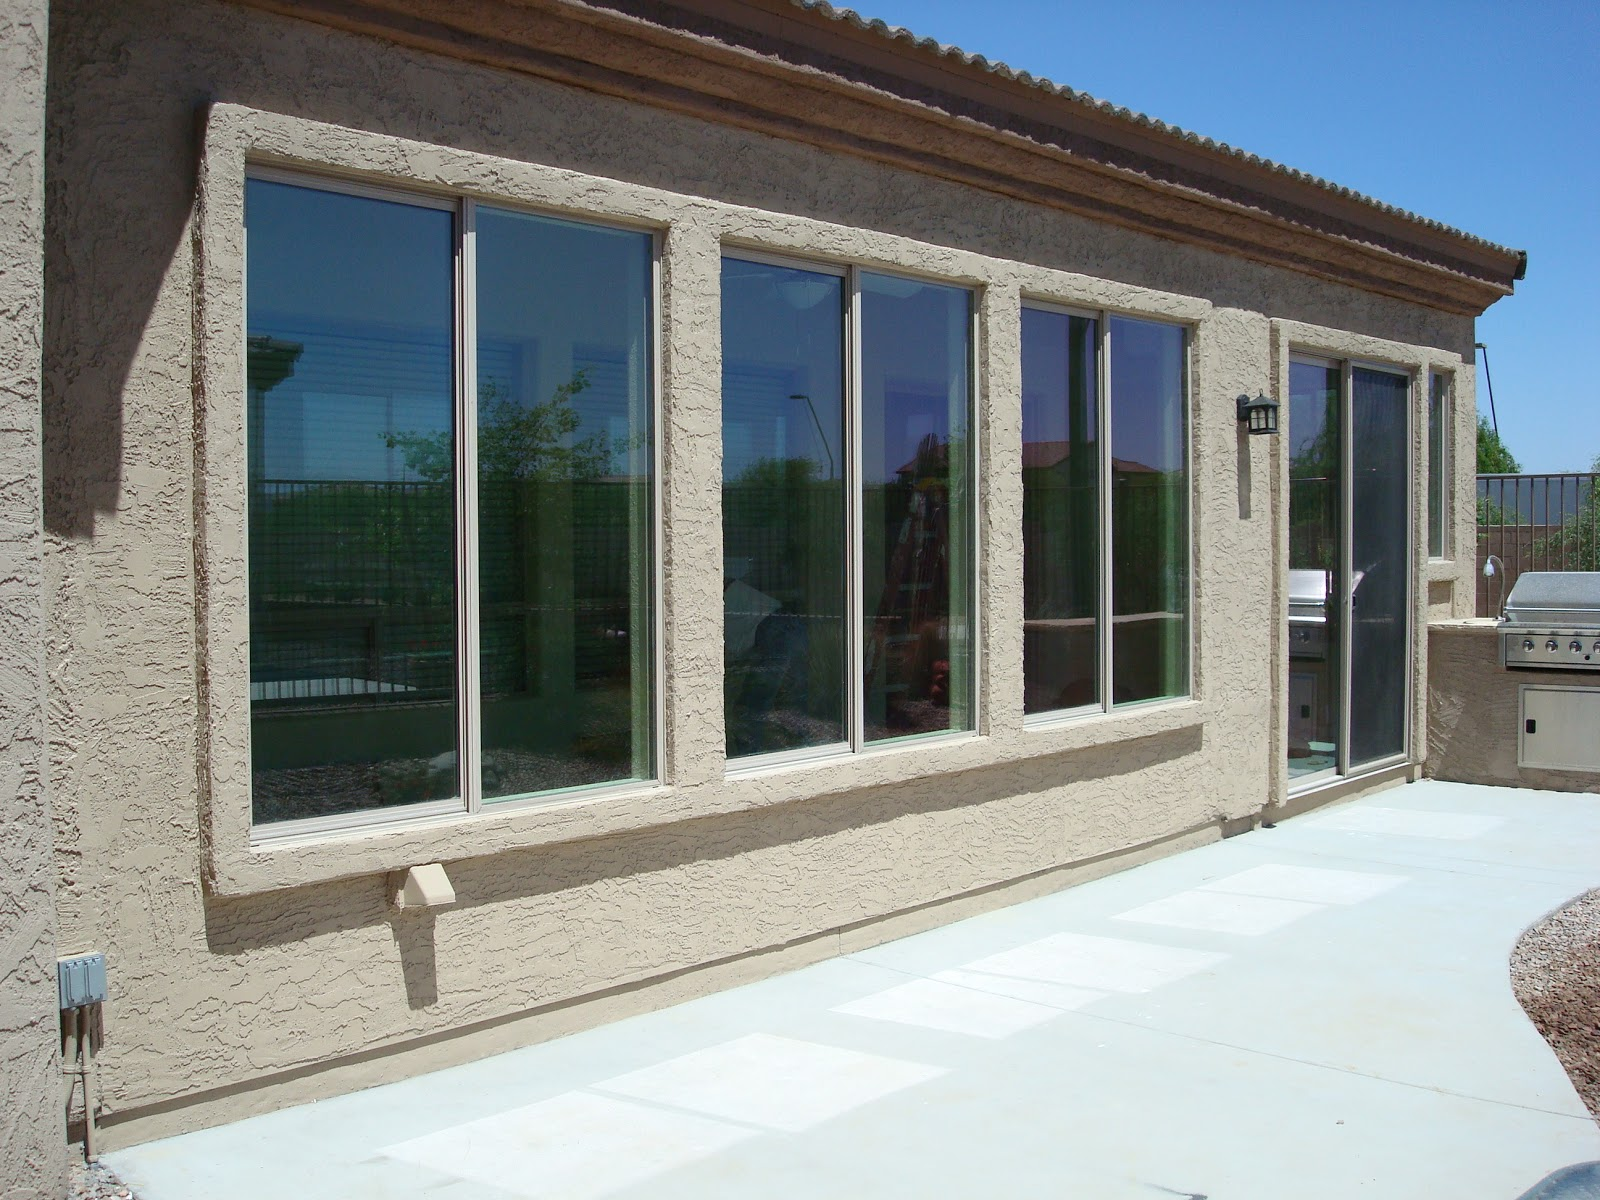 Hoa Approval For Modular Sunroom Arizona Enclosures And